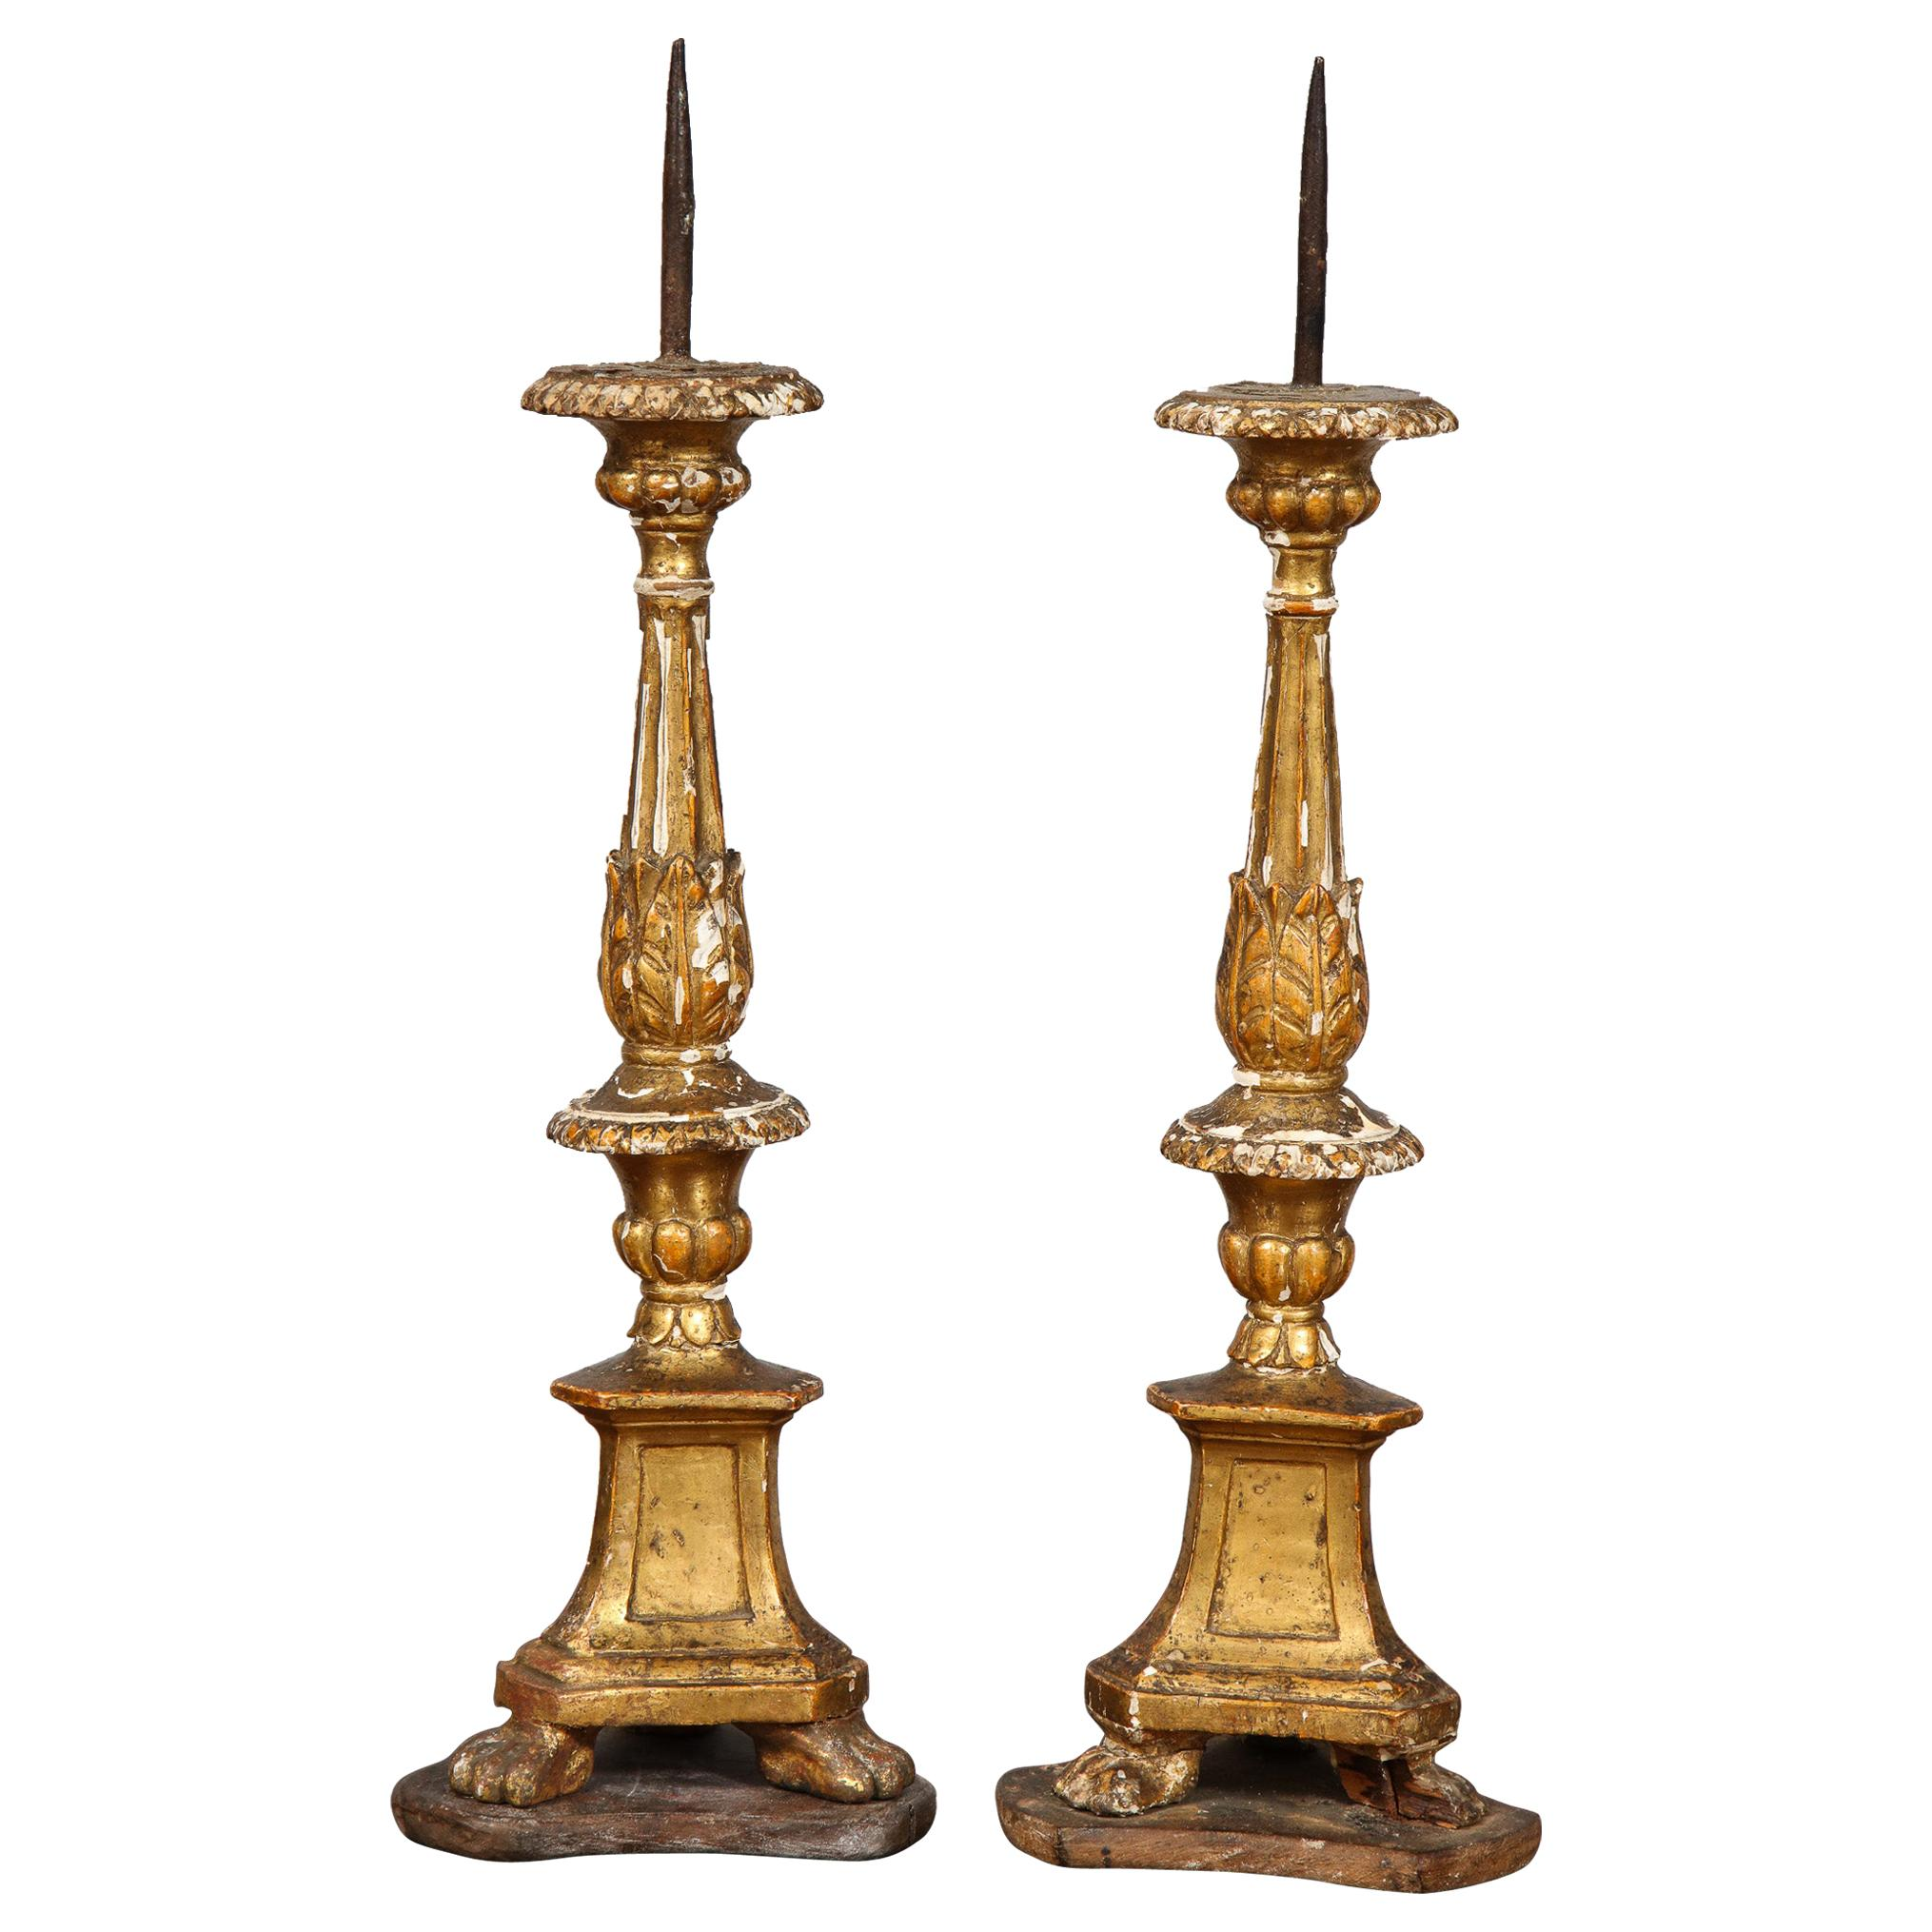 Pair of Diminutive Giltwood Pricket Candlesticks